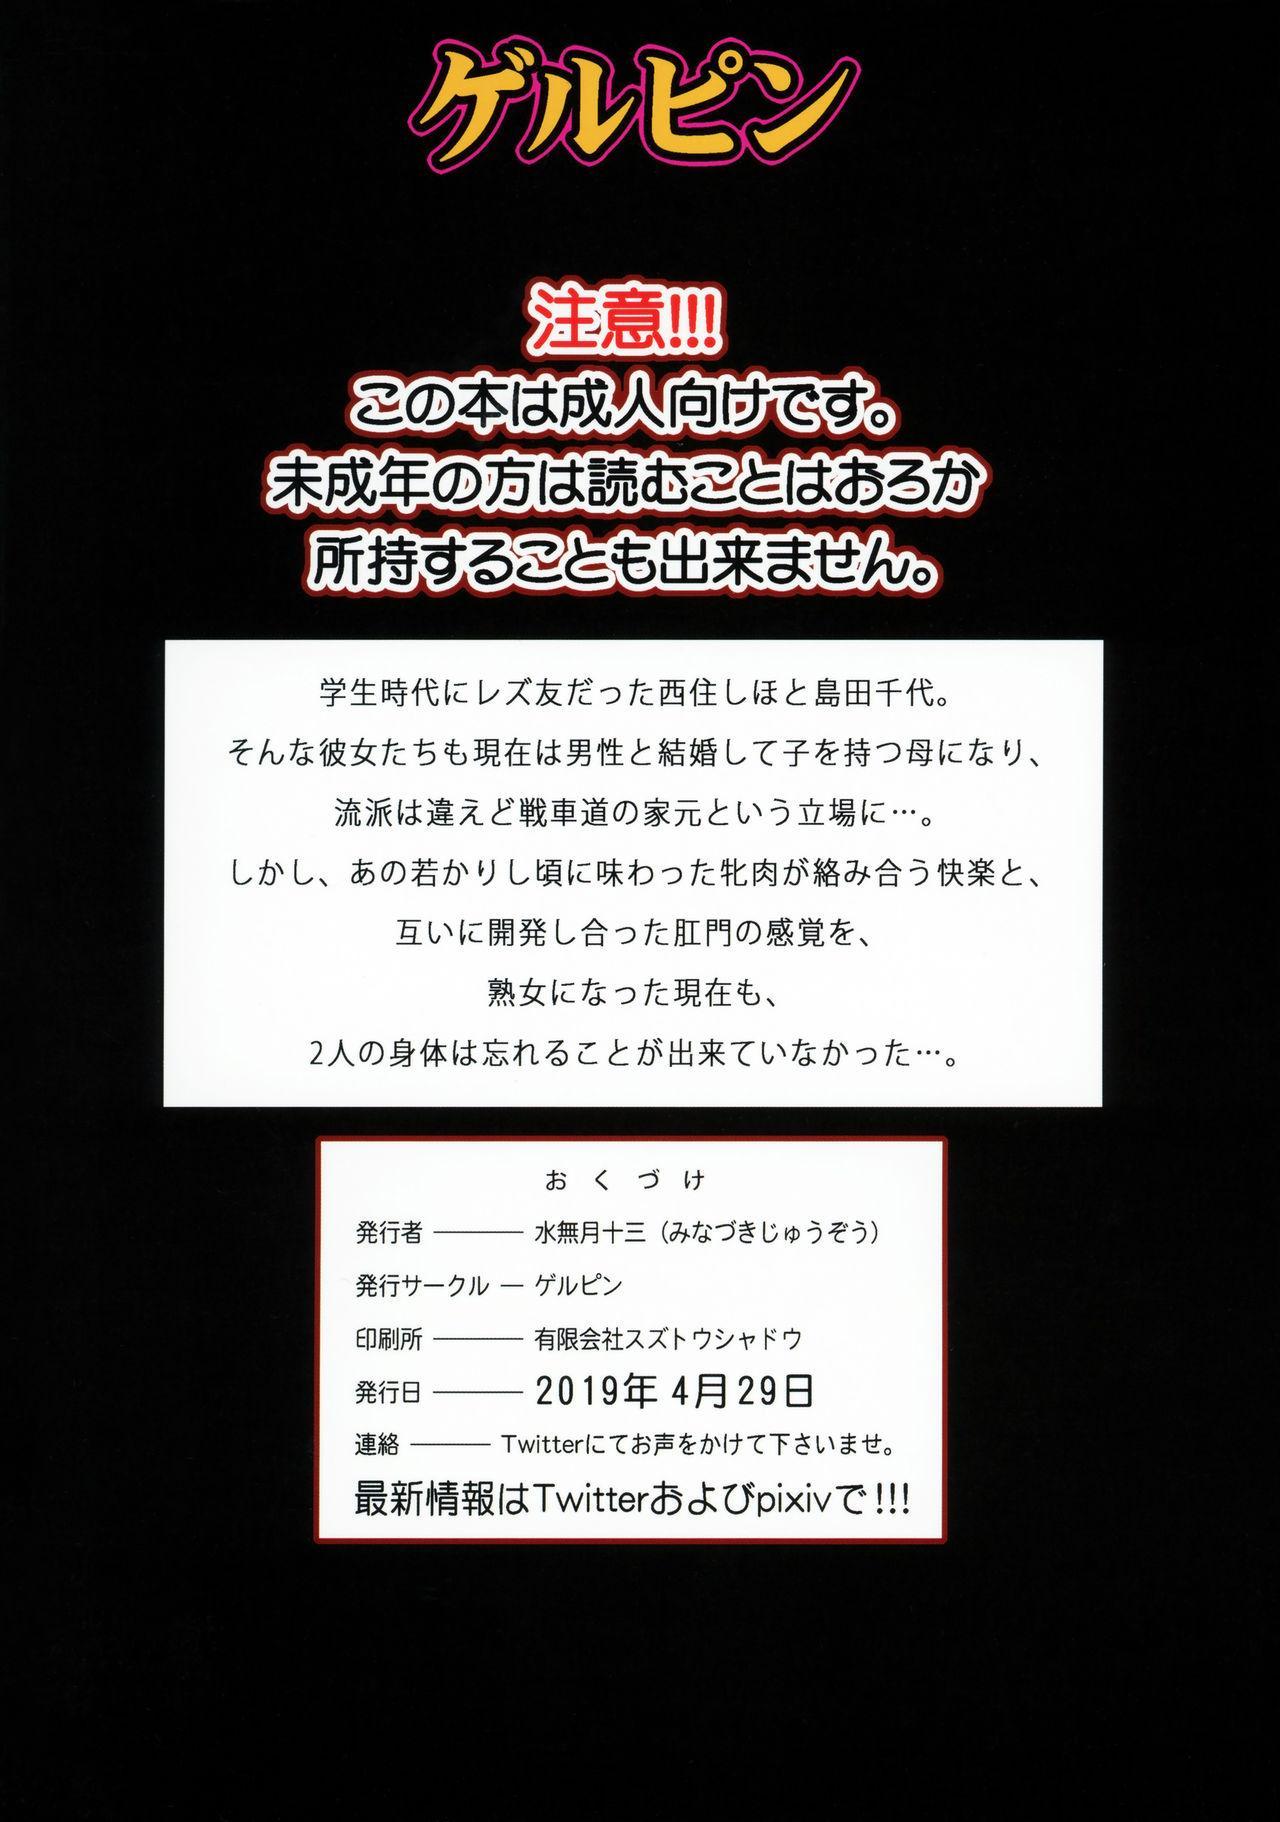 (COMIC1☆15) [Gerupin (Minazuki Juuzou, USSO)] Shimada-ryuu VS Nishizumi-ryuu Bijukujo Lesbian Kyokugen Kougyaku Gurui | Shimada Style VS Nishizumi Style MILF Lesbian Extreme Anal Fetish (Girls und Panzer) [English] 29